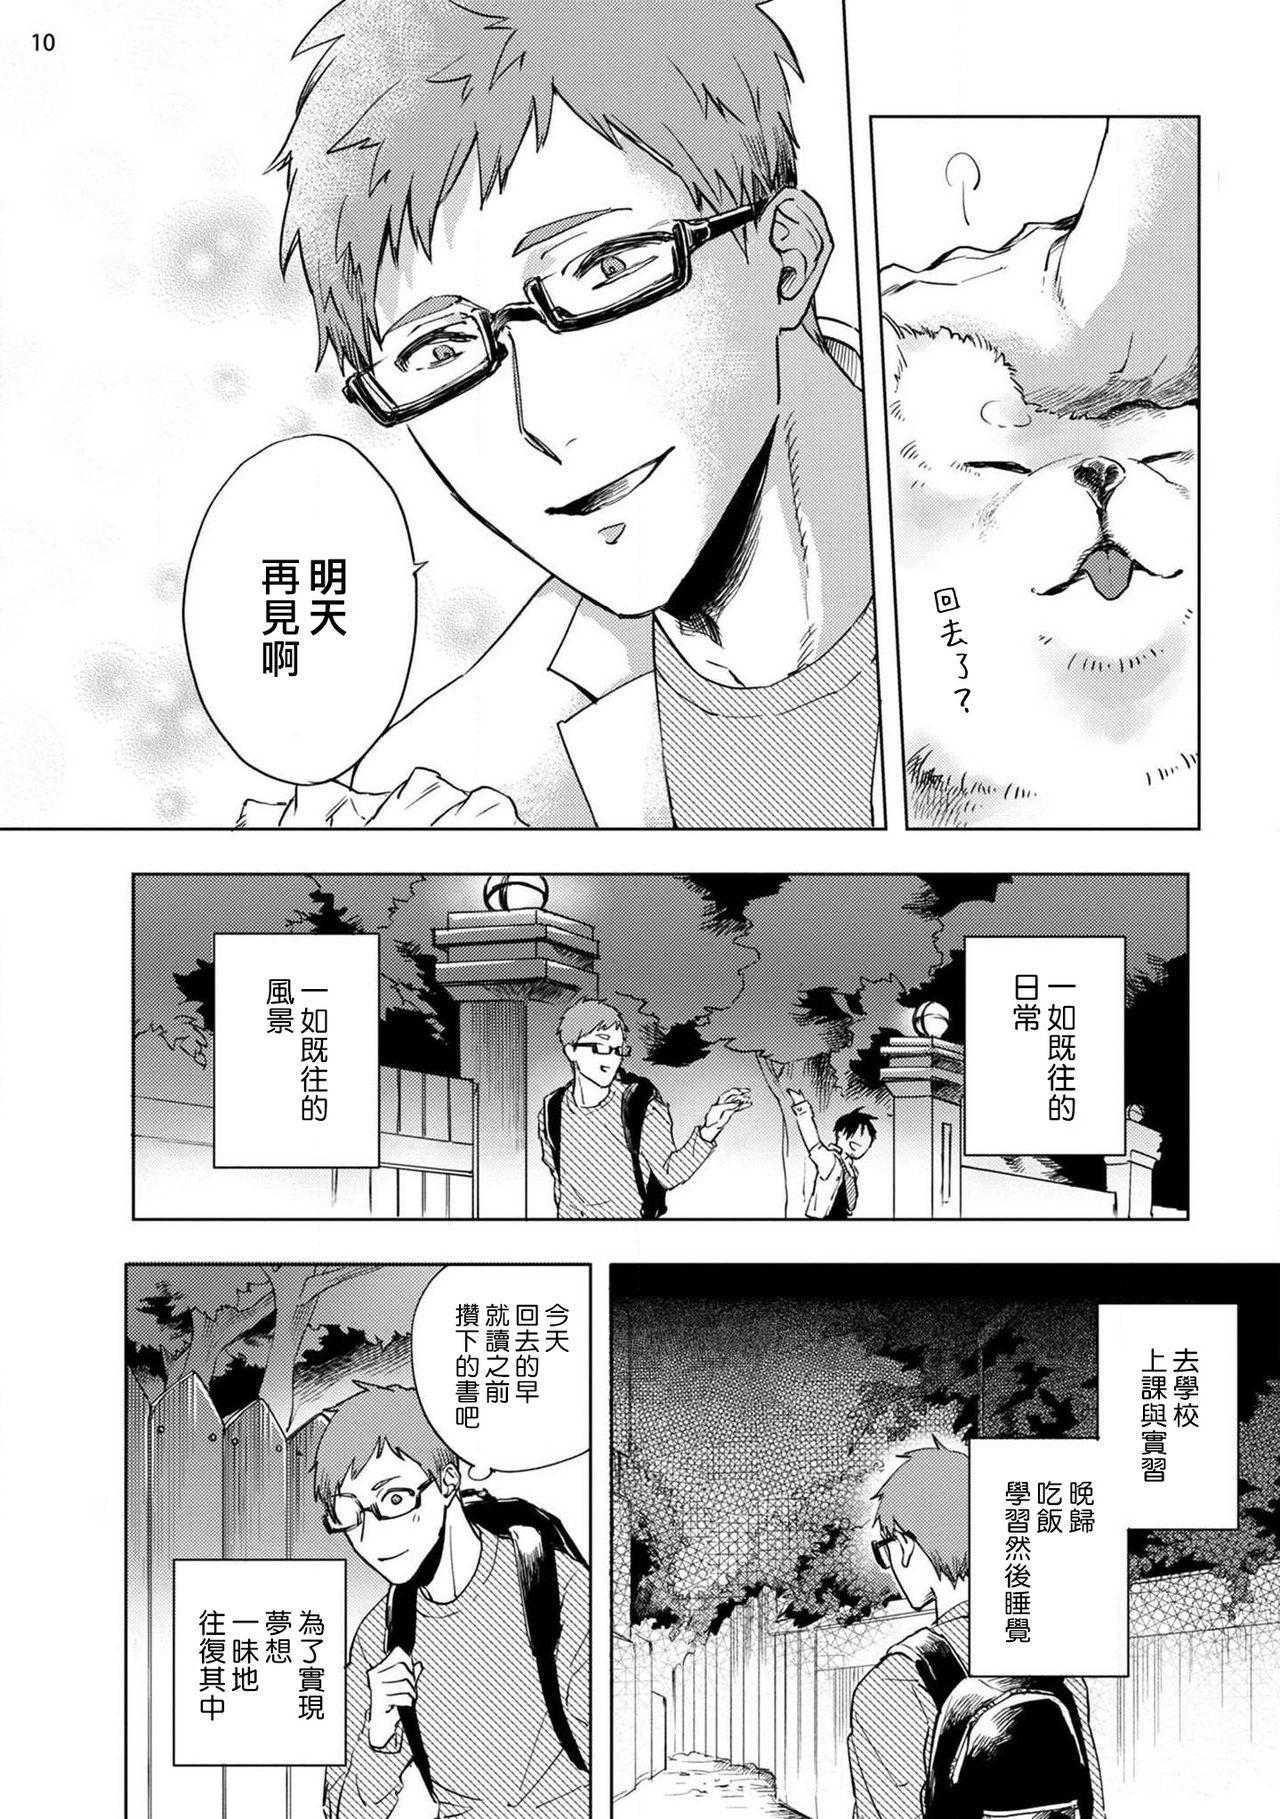 [Yao] Inma-sama ni Hallelujah!   赞美淫魔大人! Ch. 1-3 [Chinese] [拾荒者汉化组] [Digital] 10